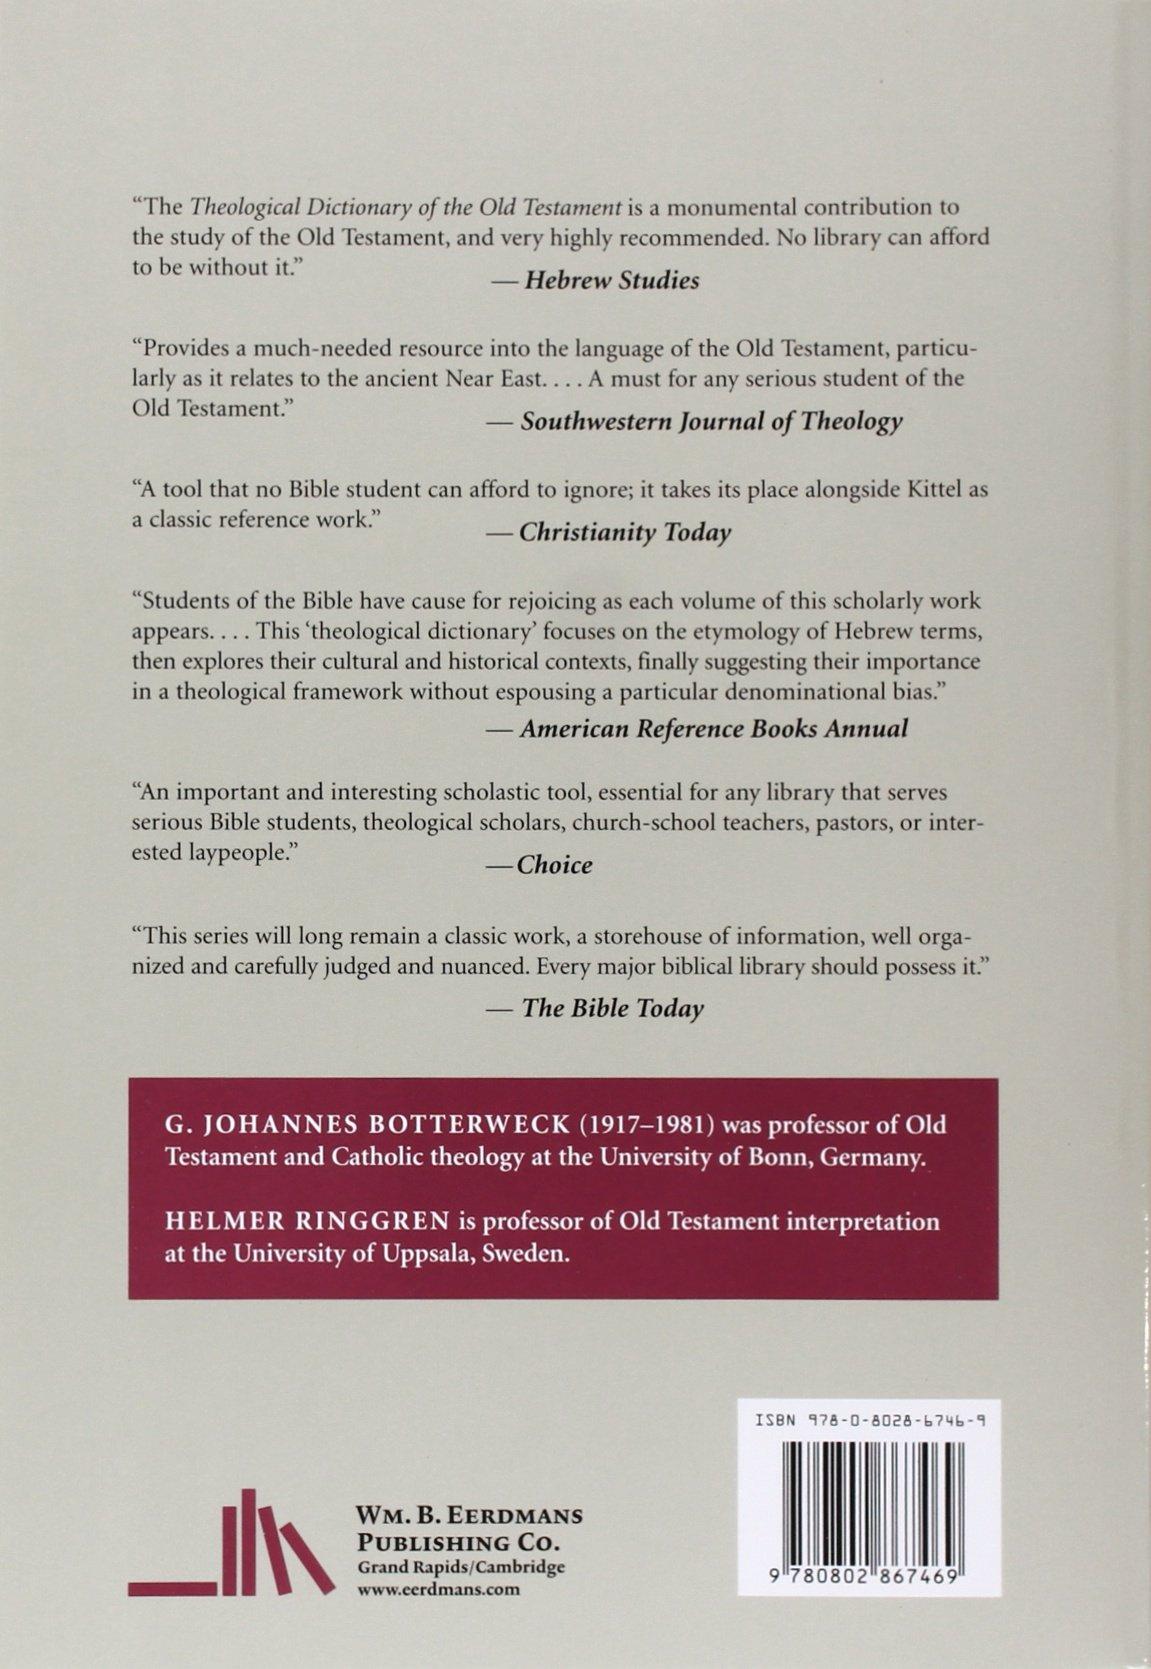 Theological Dictionary of the Old Testament, Volume I: G. Johannes  Botterweck, Helmer Ringgren: 9780802867469: Amazon.com: Books